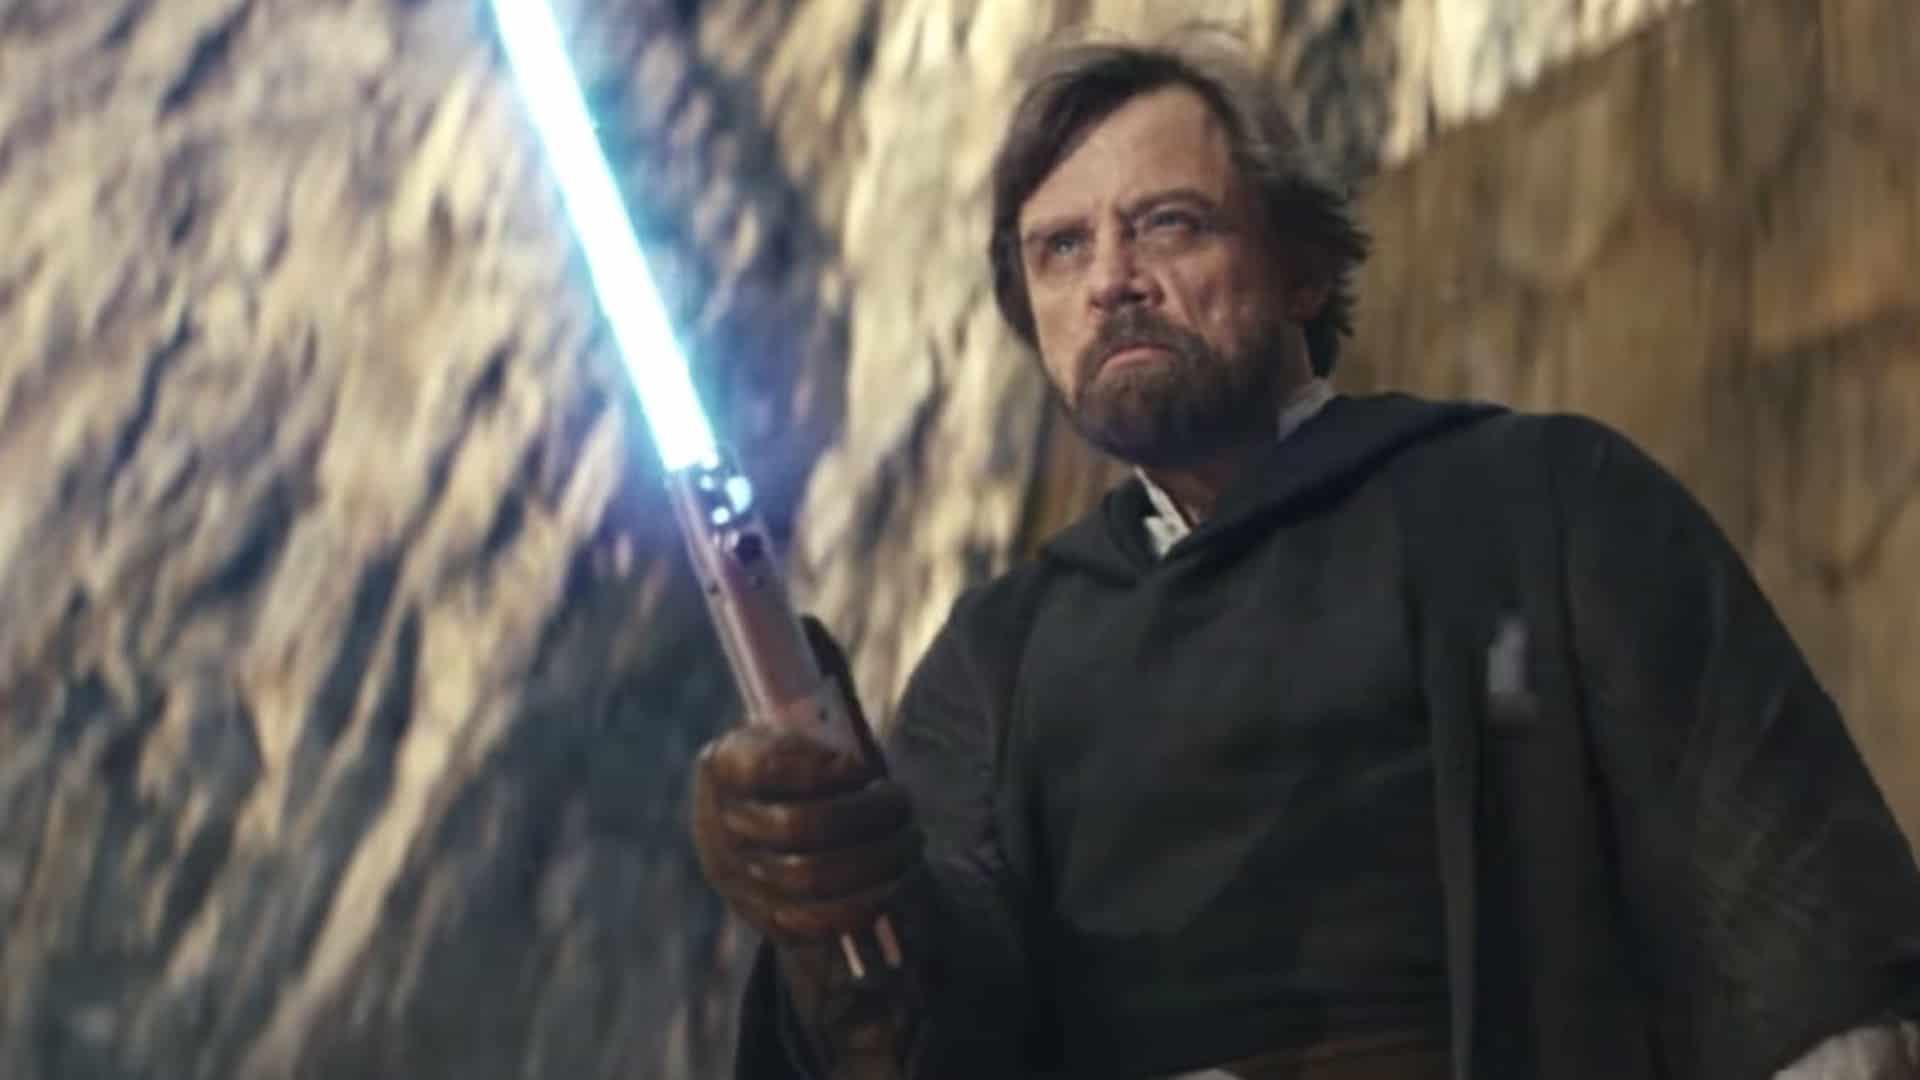 Luke Skywalker, Last Jedi, Kylo Ren, Crait, Episode VIII